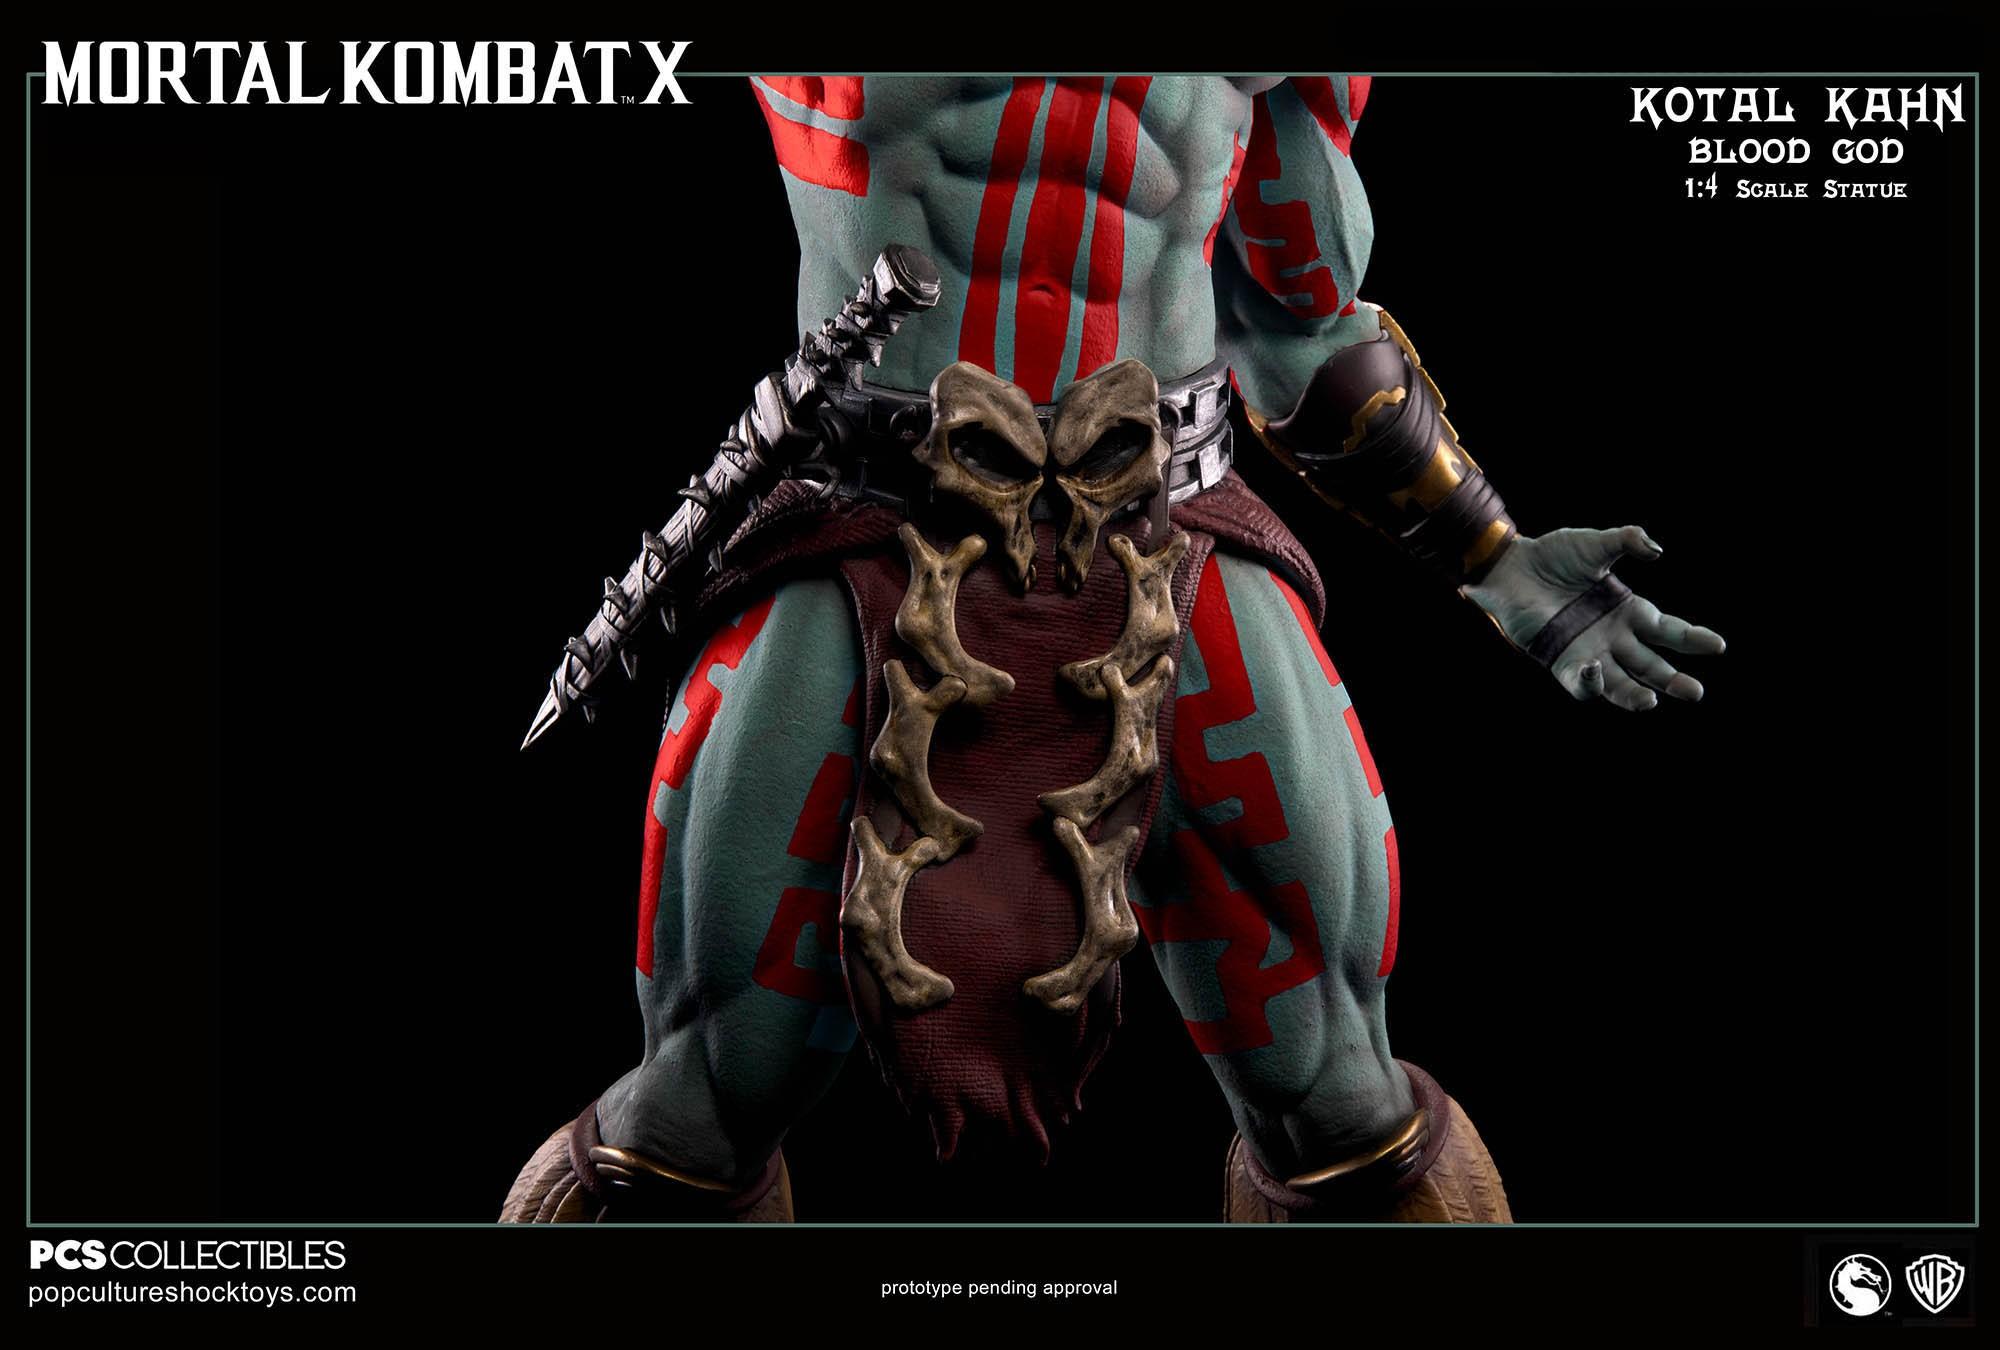 [Pop Culture Shock] Mortal Kombat X: Kotal Kahn 1:4 scale PCS-Kotal-Kahn-Blood-God-021